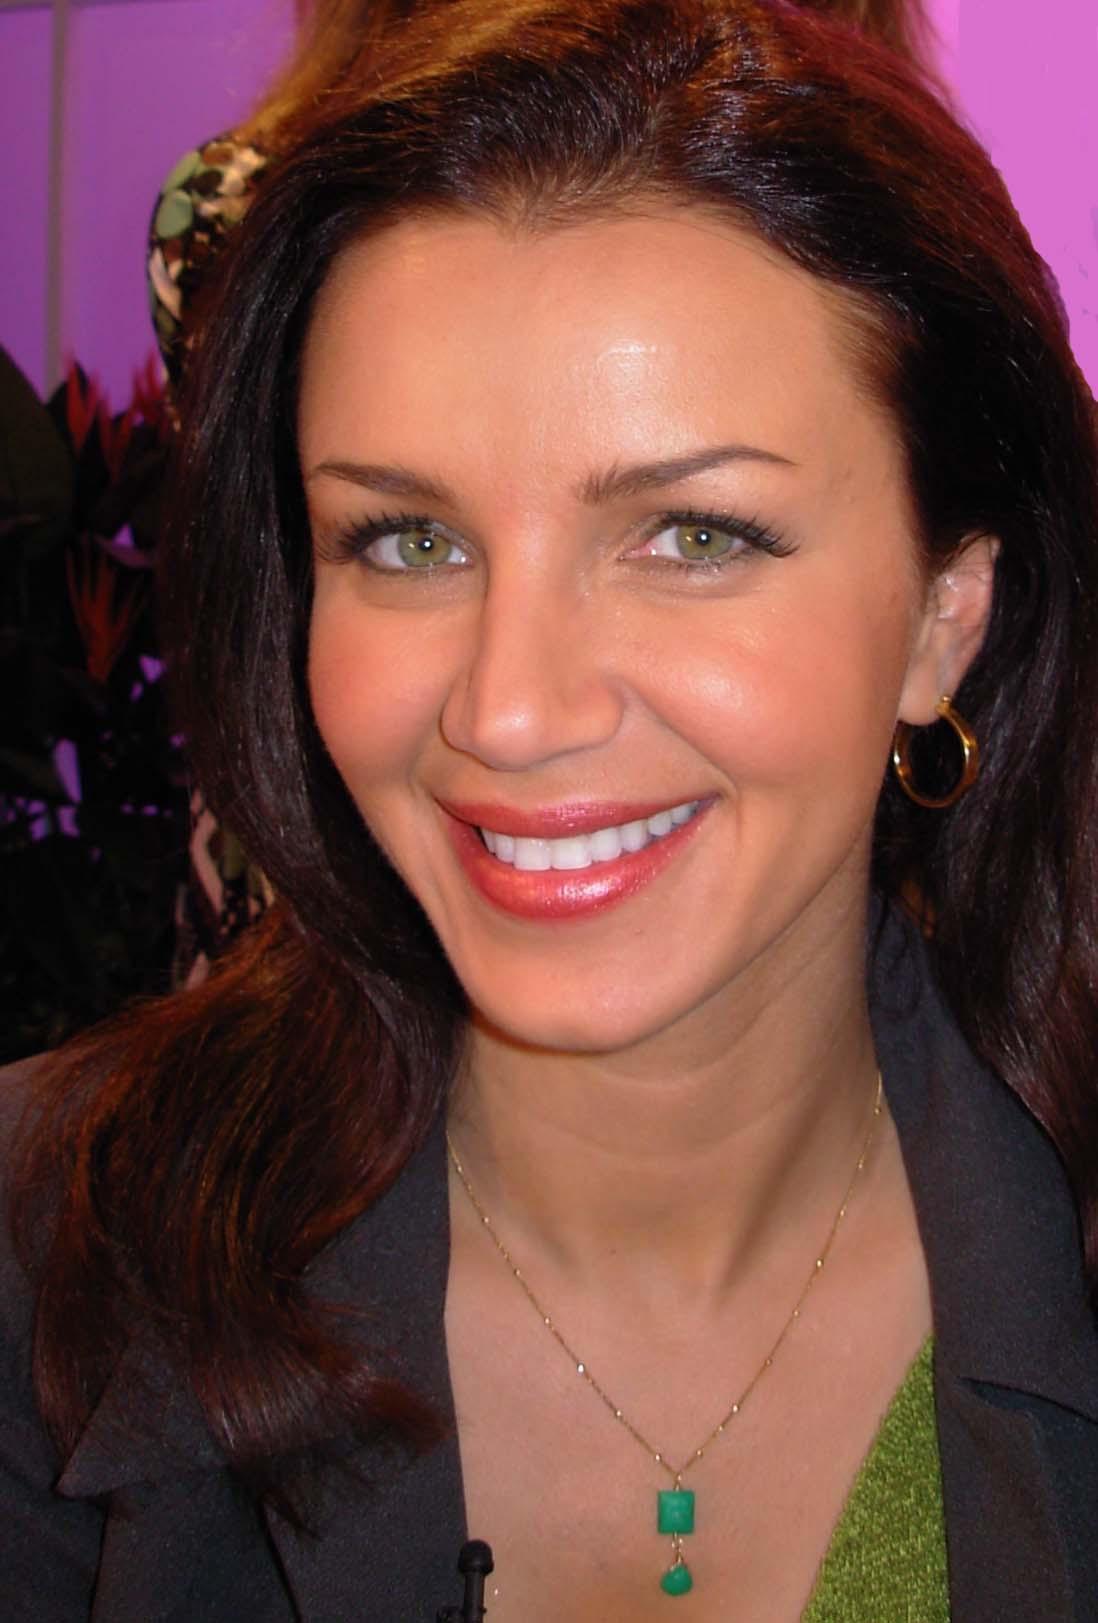 Lana Asanin - The Mentalist